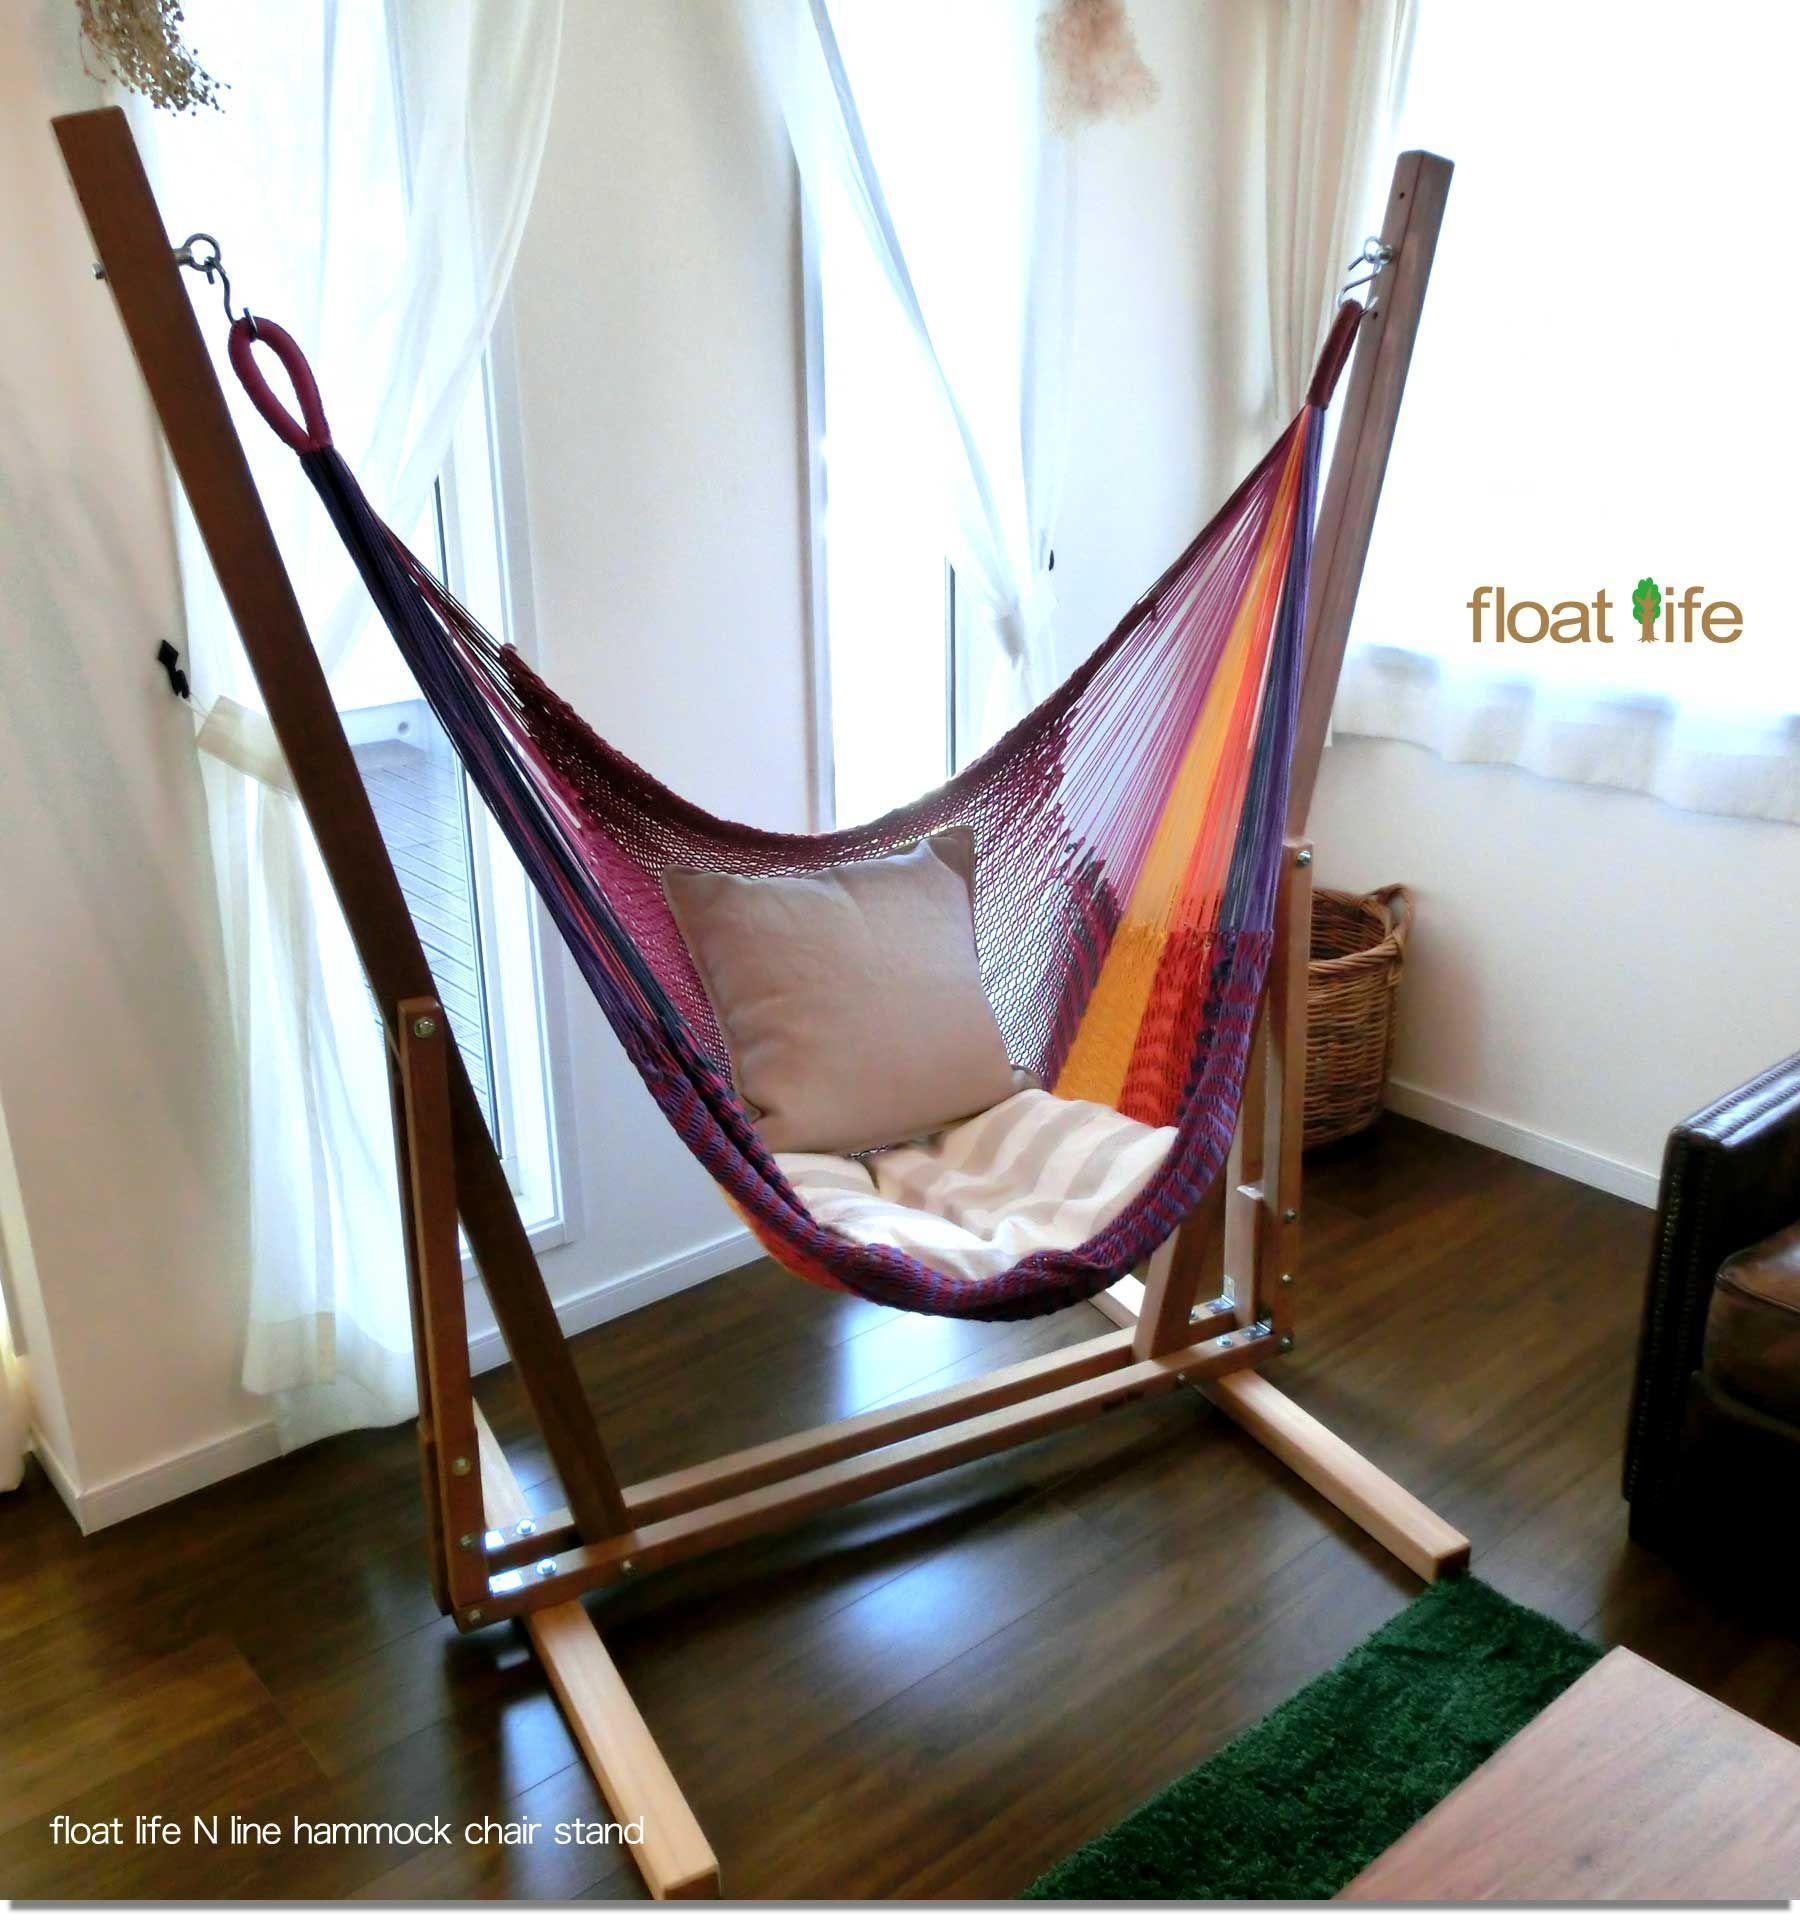 2nd Apeman | Rakuten Global Market: Chair Hammock Room Setting Wood Stands  Float Life N Line